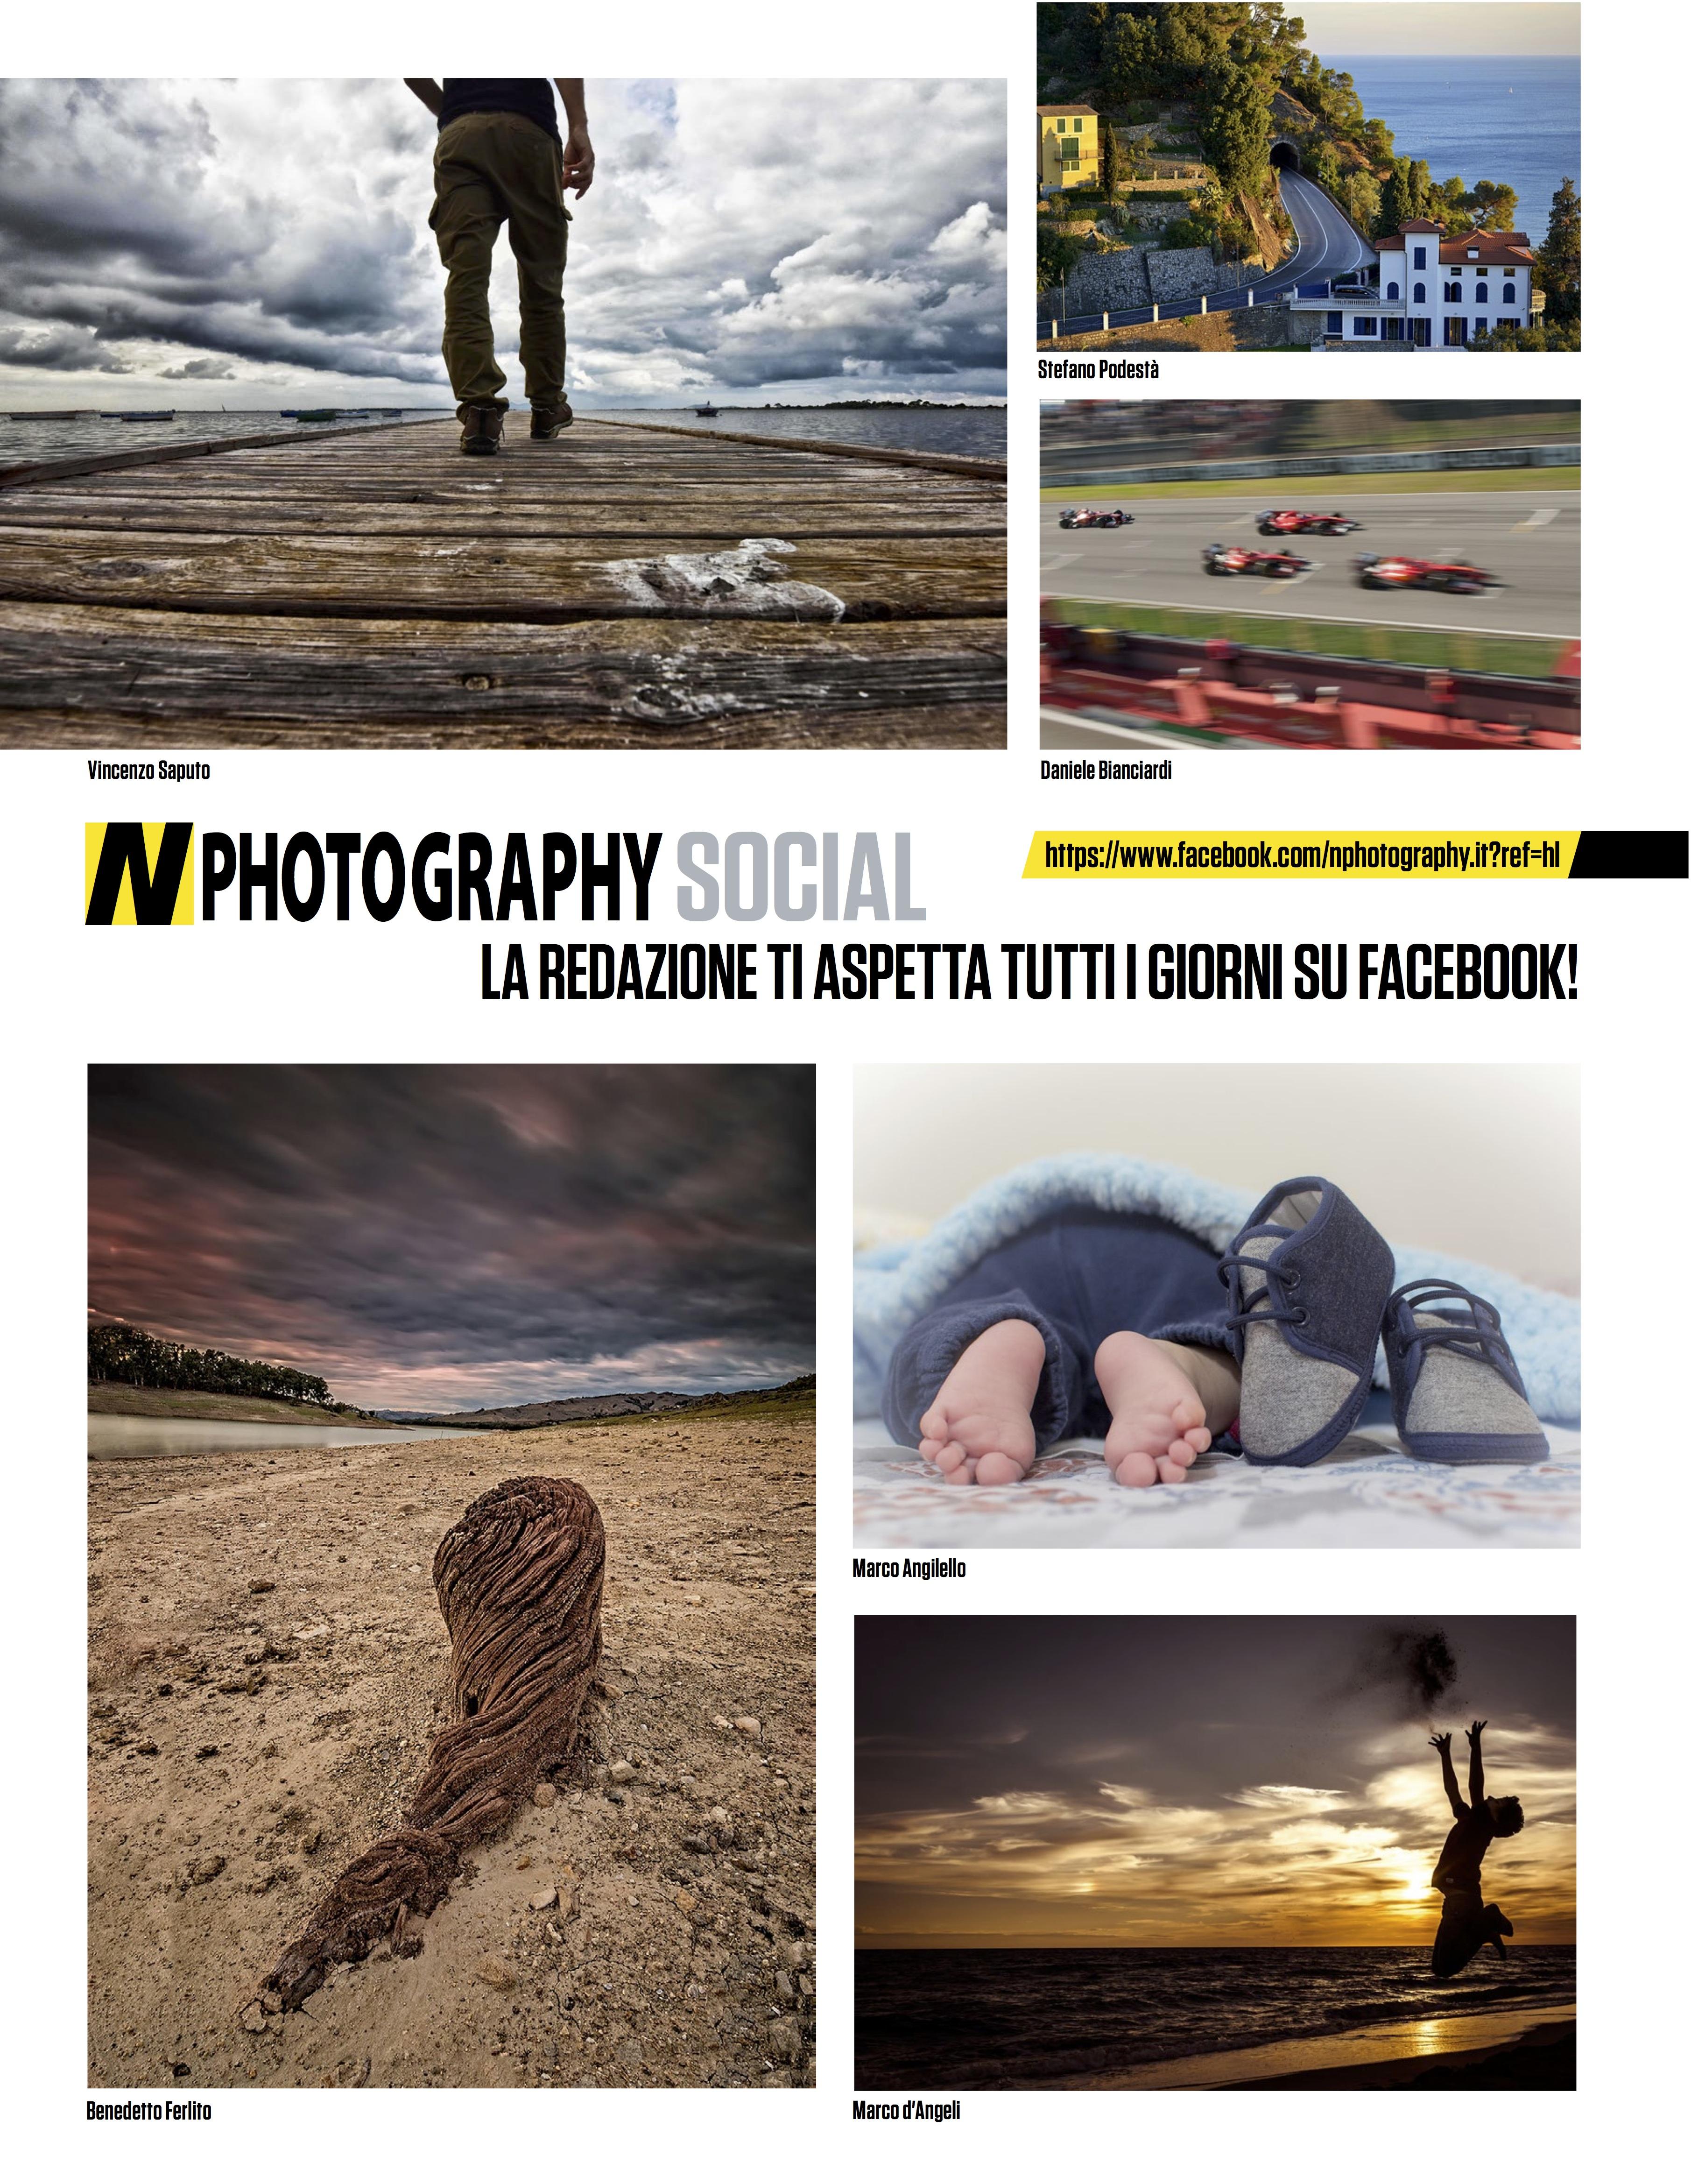 N Photography - 47 febbraio 2016 (trascinato)